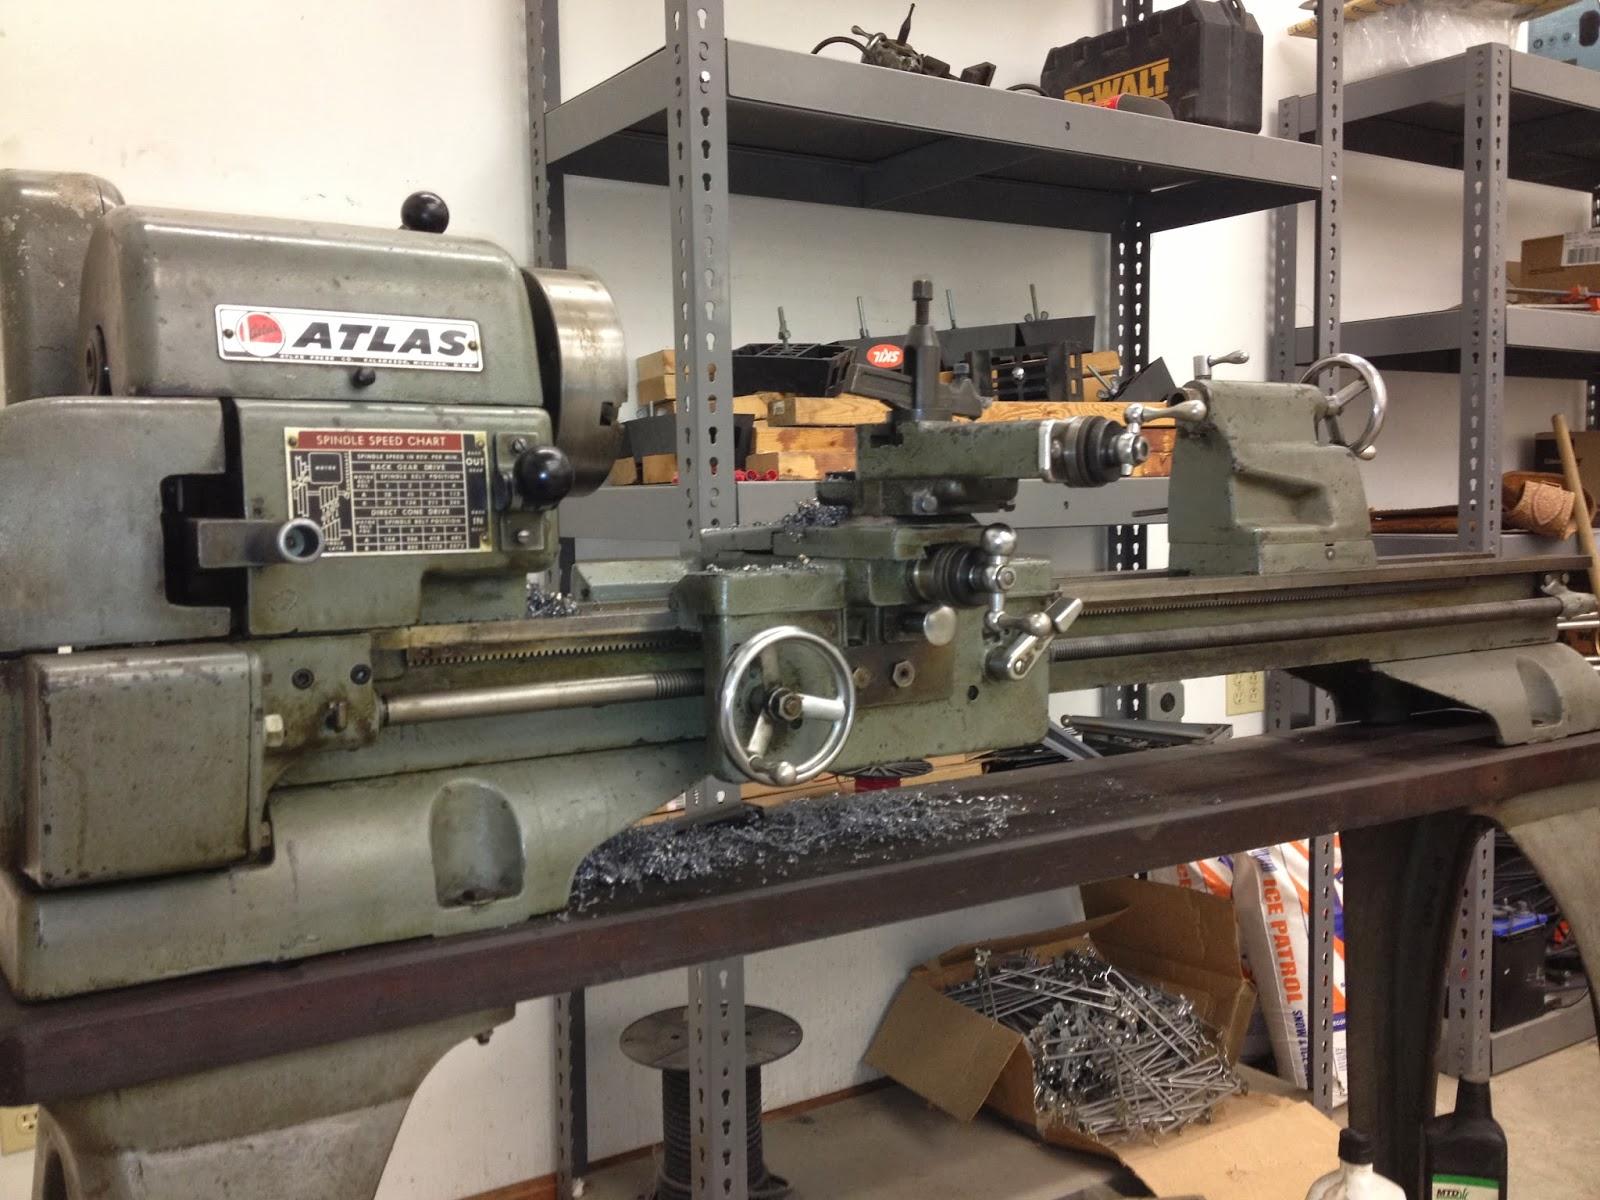 Atlas Metal Lathe Model 618